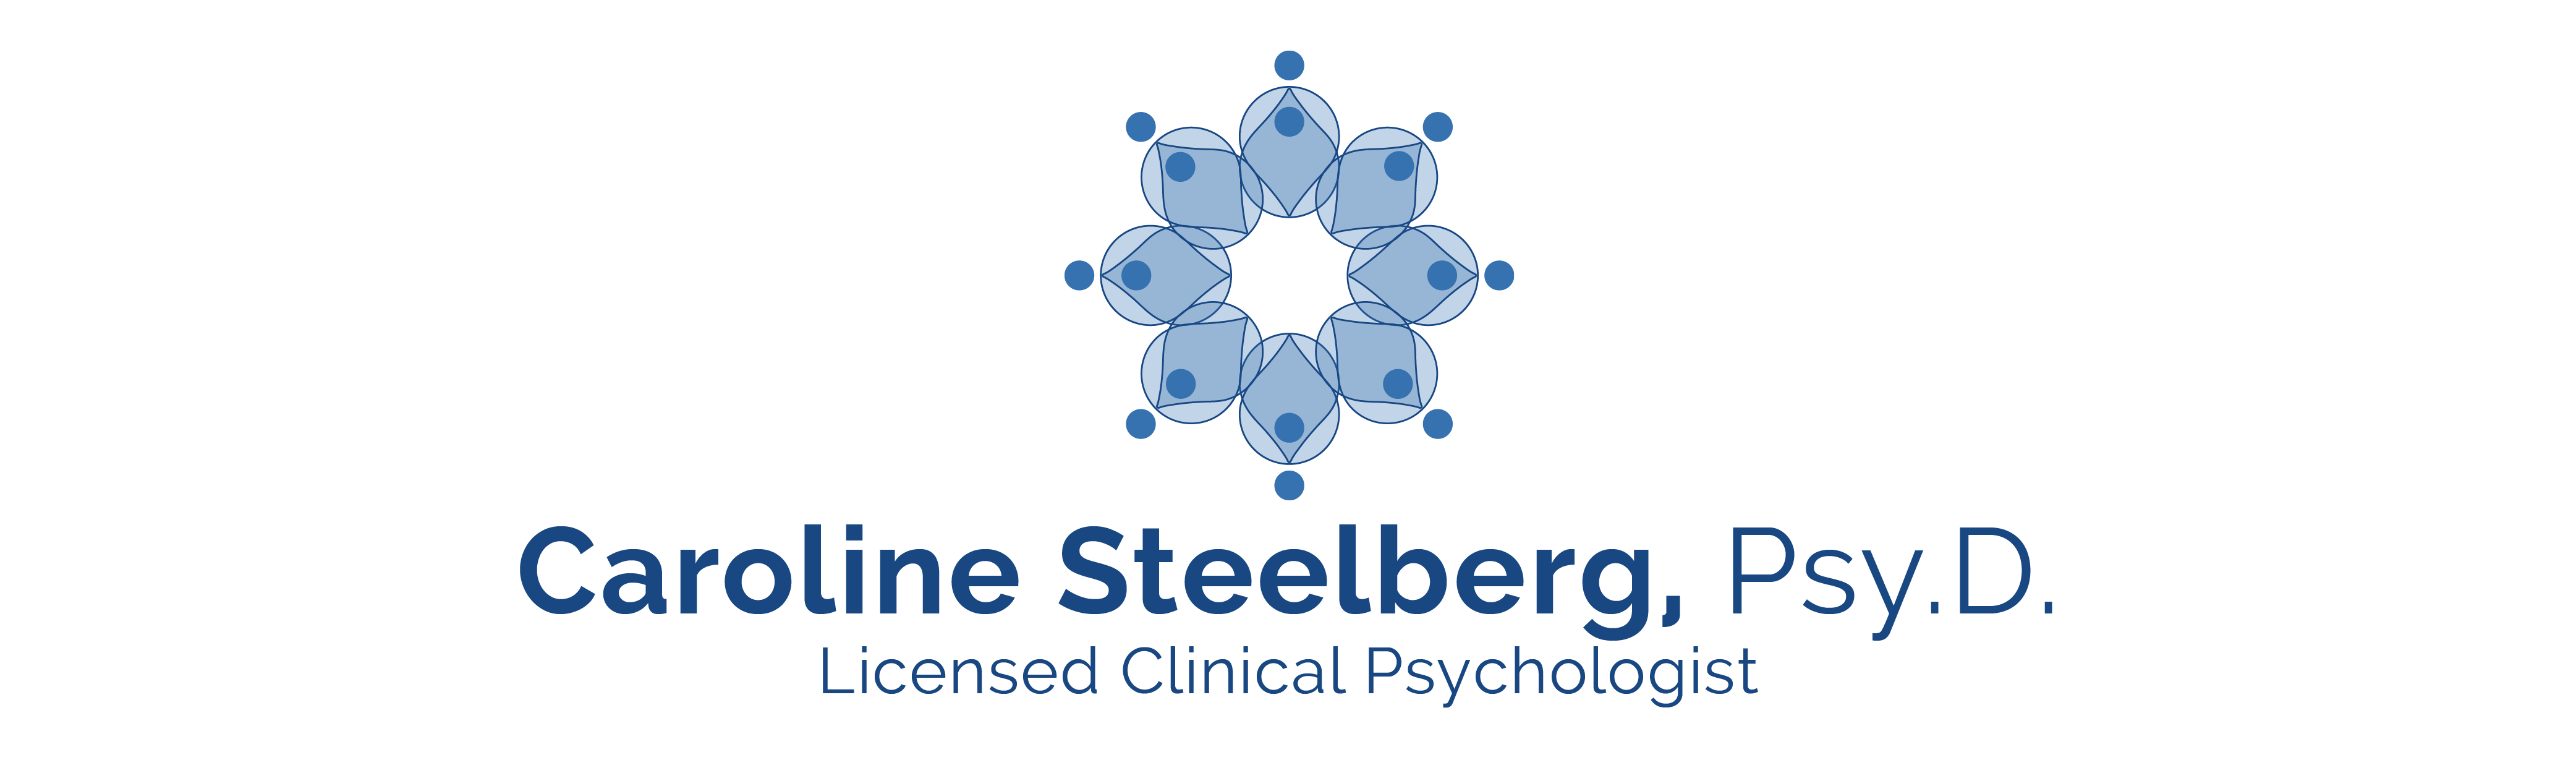 CAROLINE  STEELBERG, PSY.D. - Chicago Psychologist